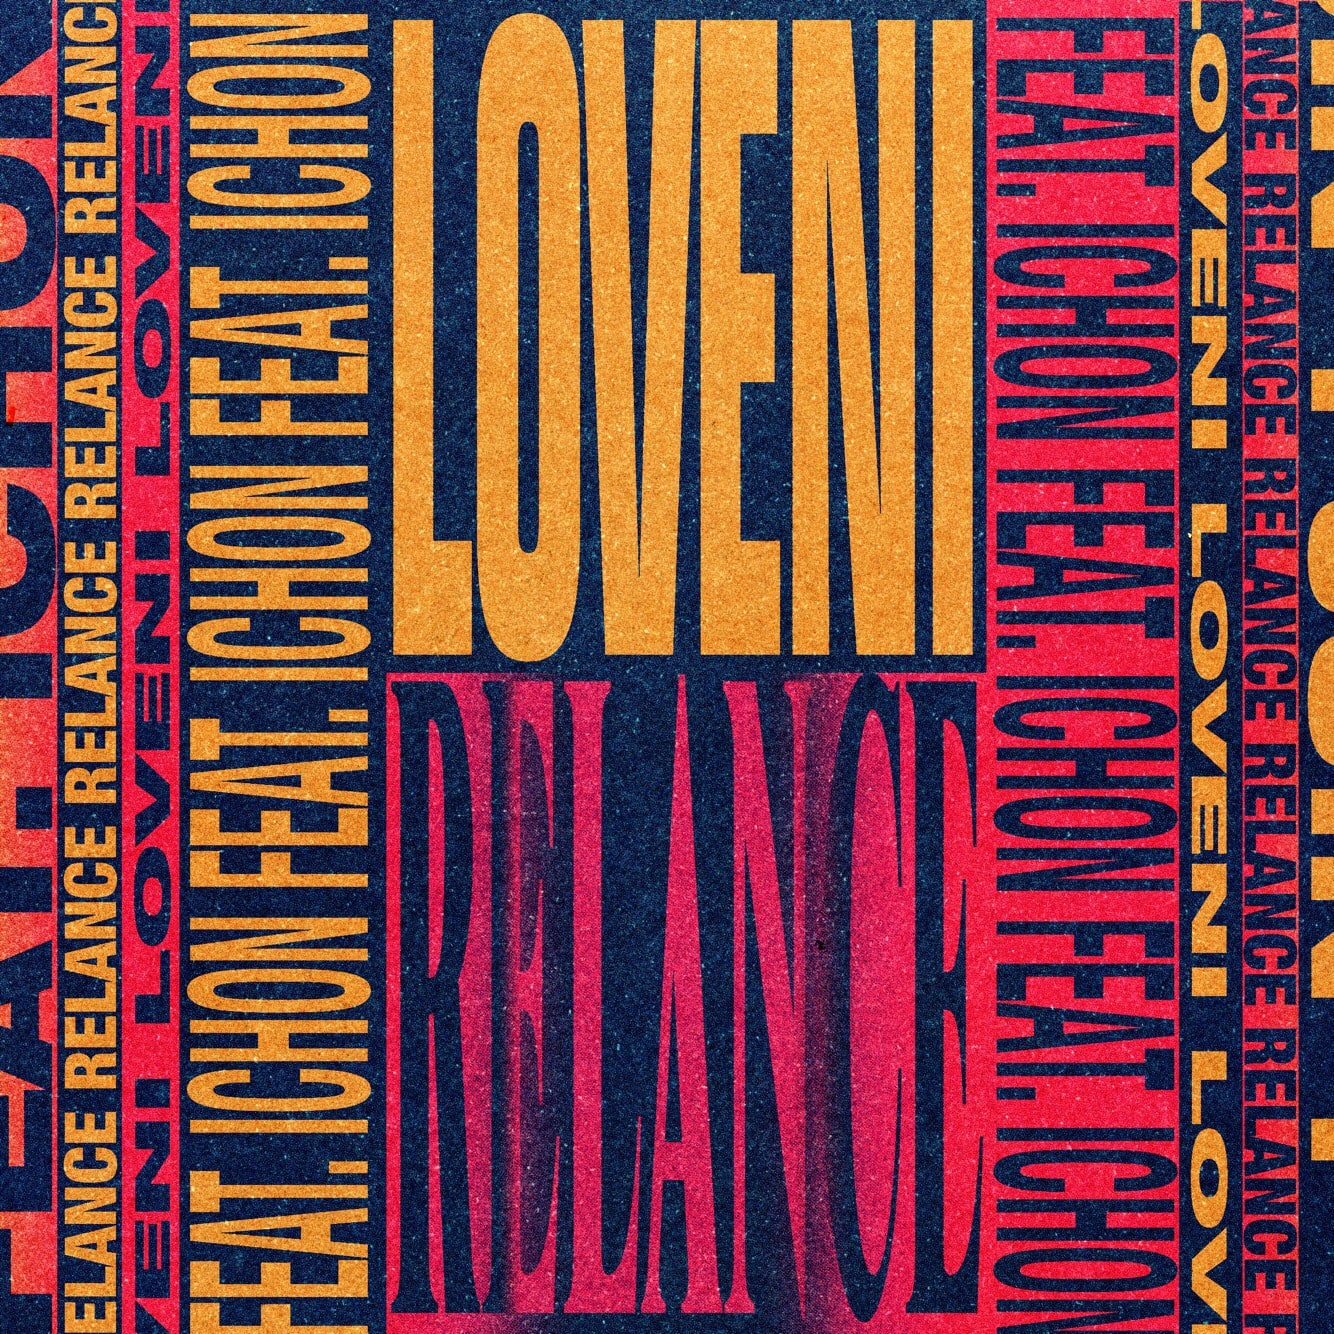 Loveni Ichon Relance Modzik